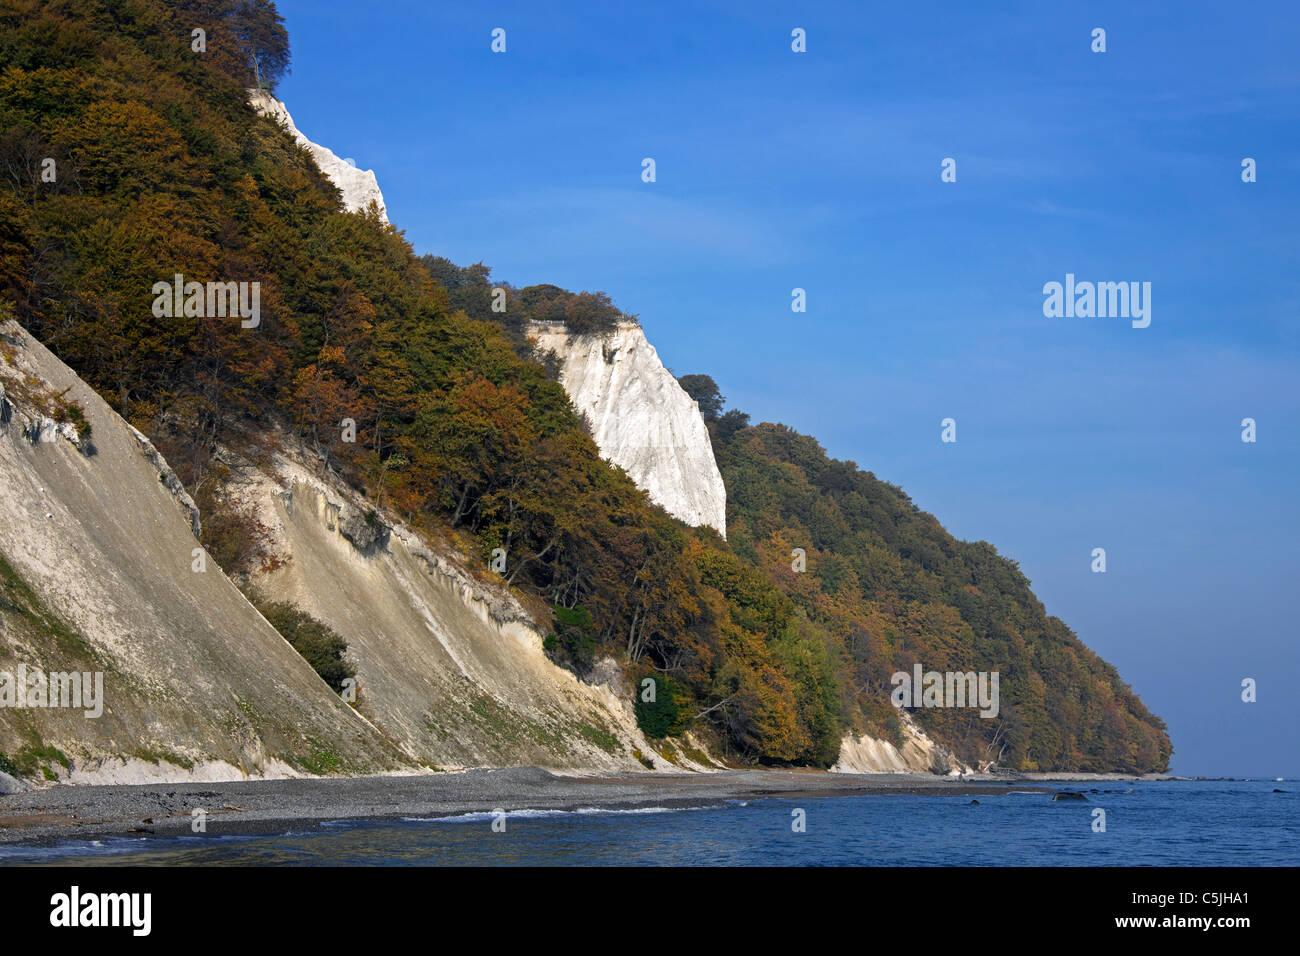 Chalk cliffs at Koenigsstuhl / Königsstuhl, Jasmund National Park, island of Ruegen, Mecklenburg-Western Pomerania, Stock Photo